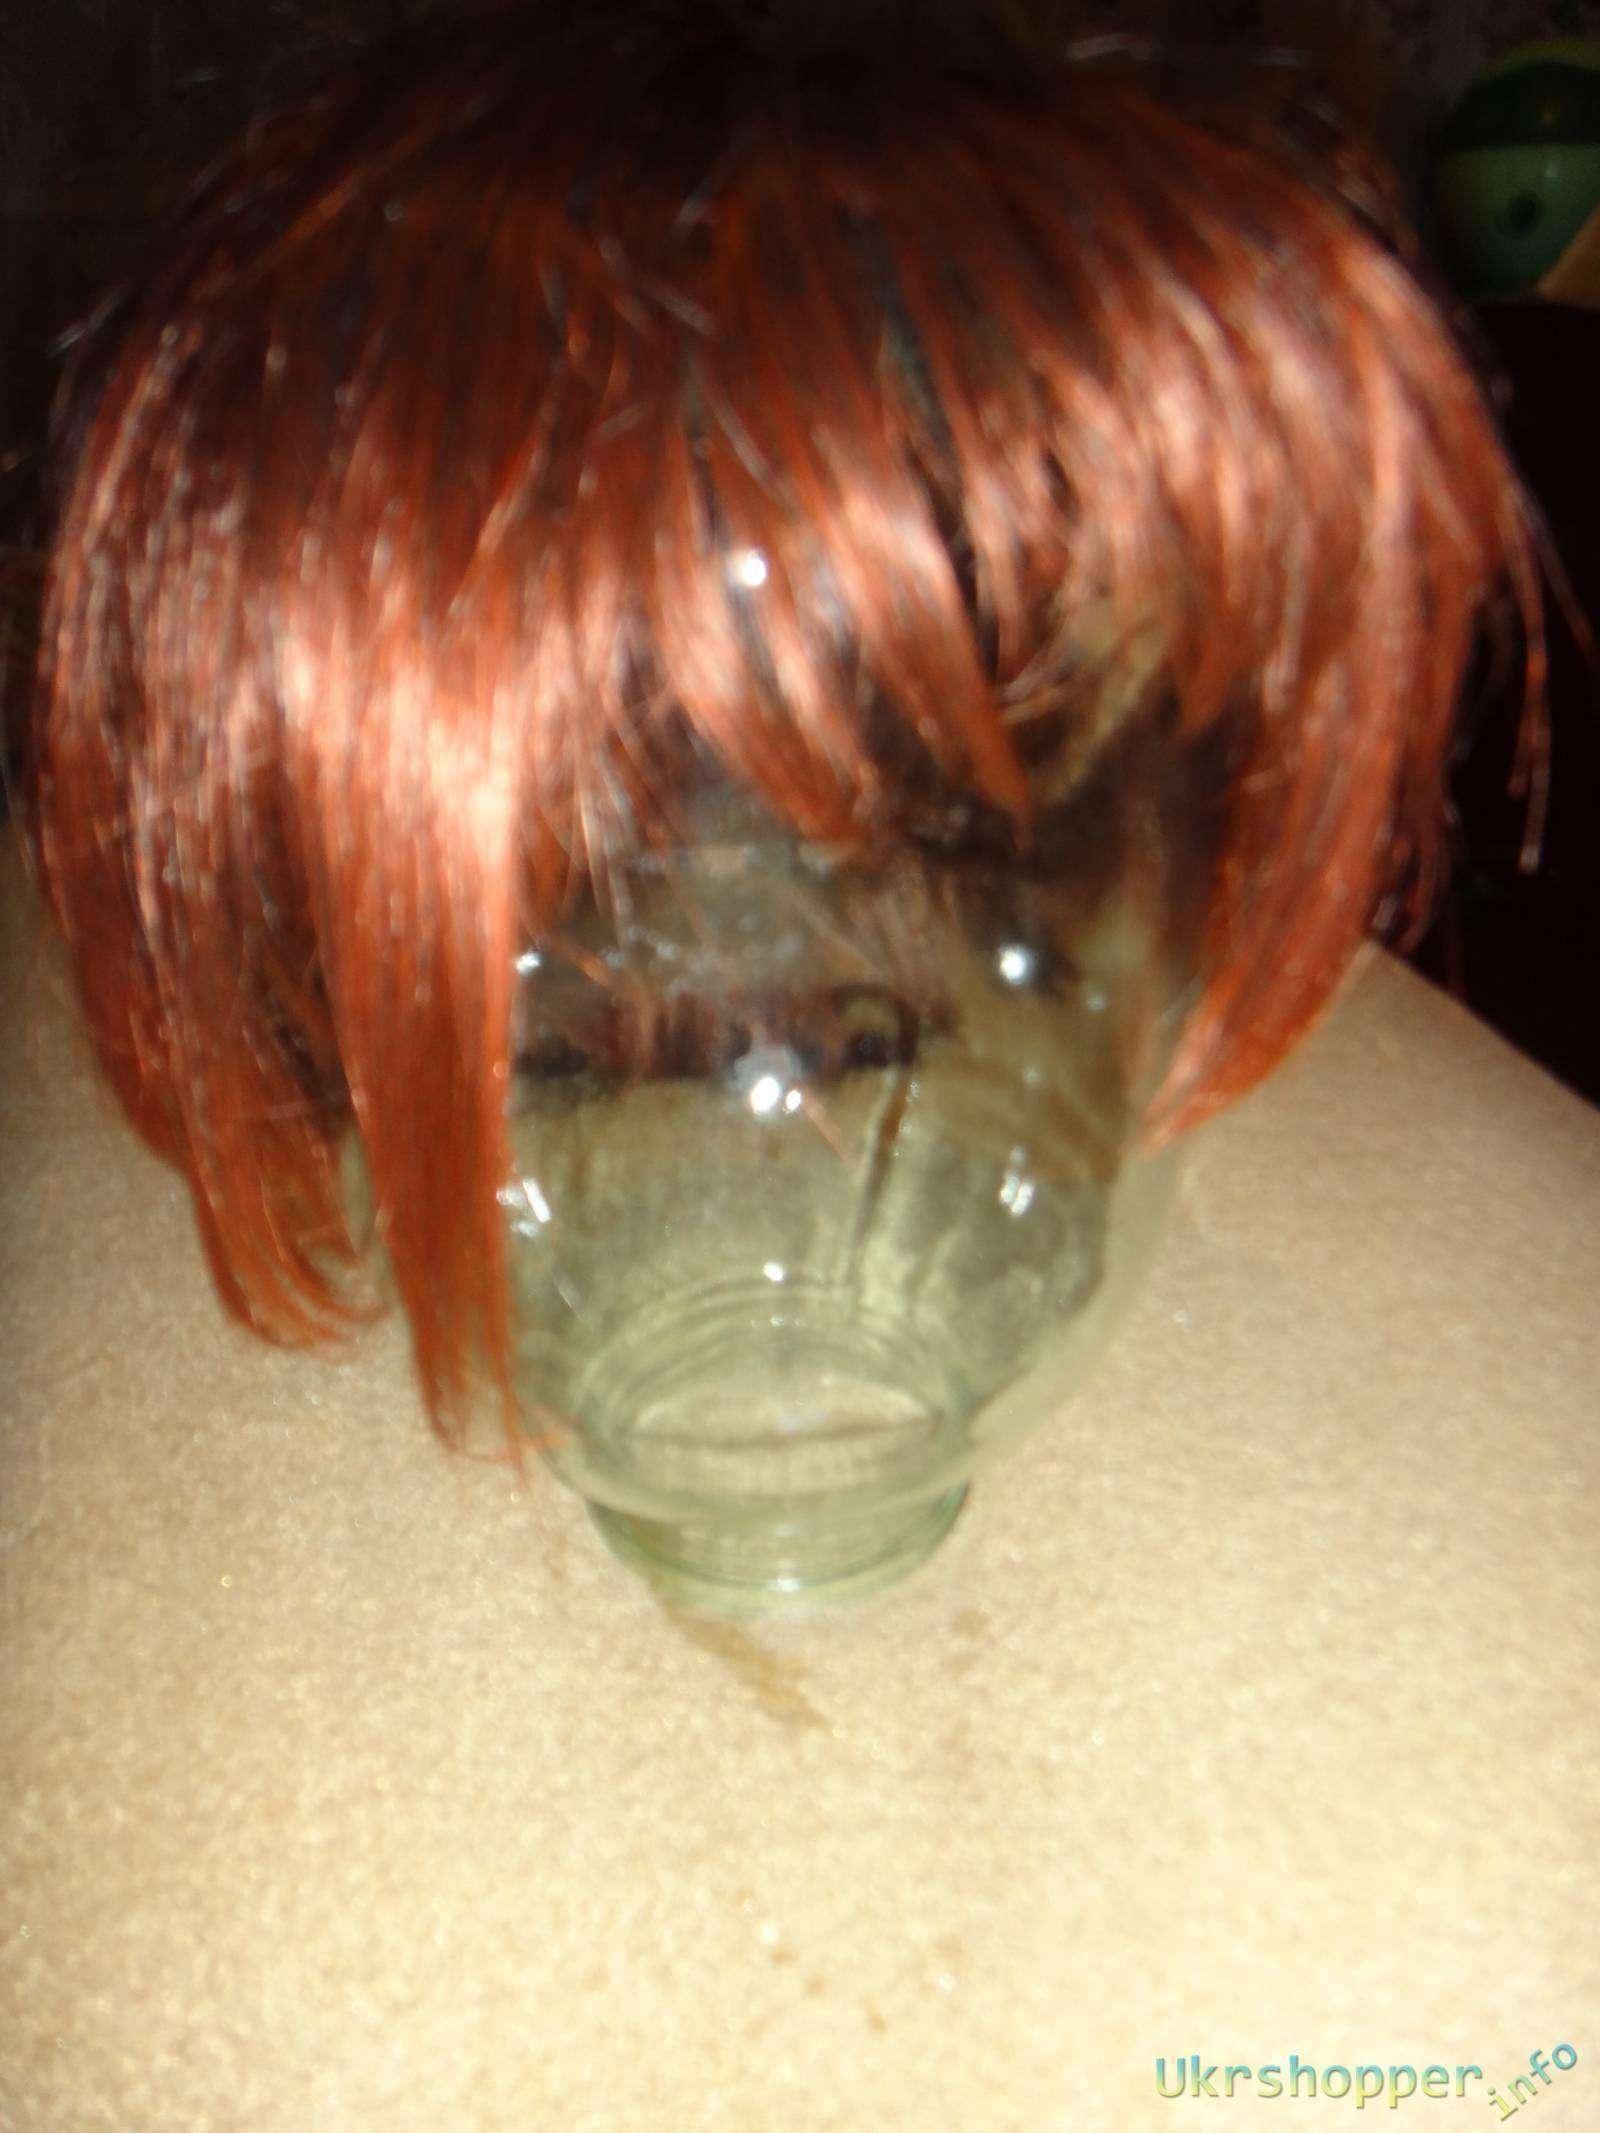 Aliexpress: Обзор женского парика со стрижкой каре